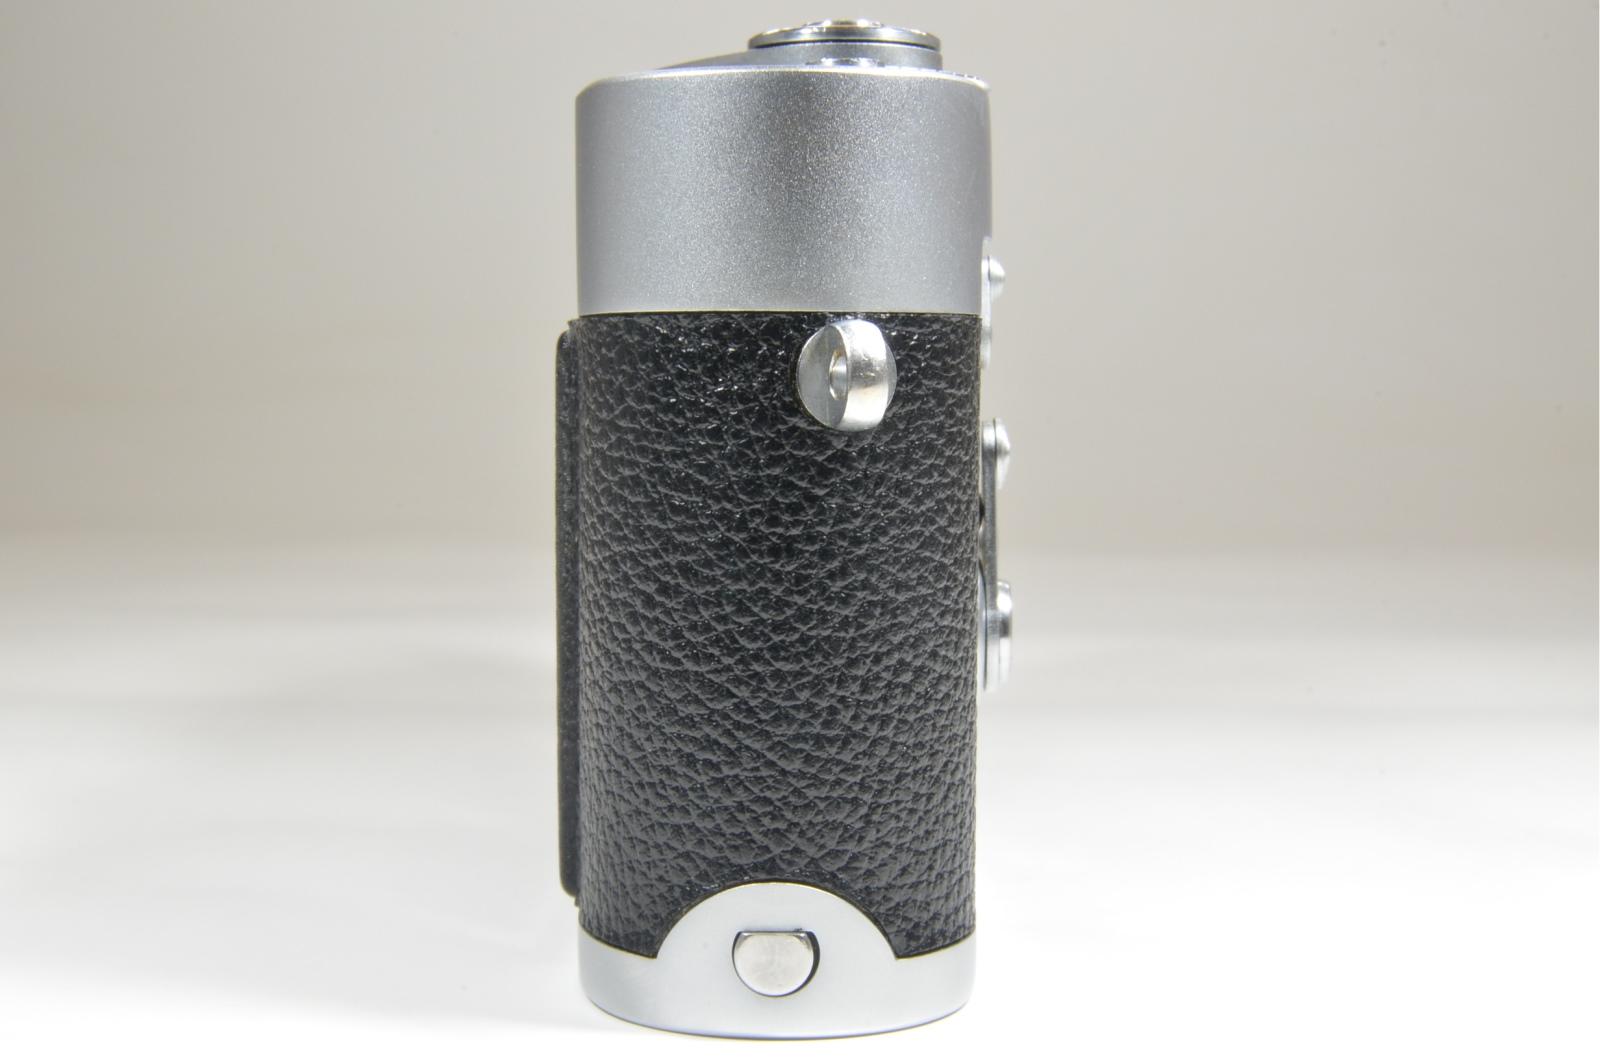 leica m2 self timer rangefinder film camera s/n 1054179 year 1962